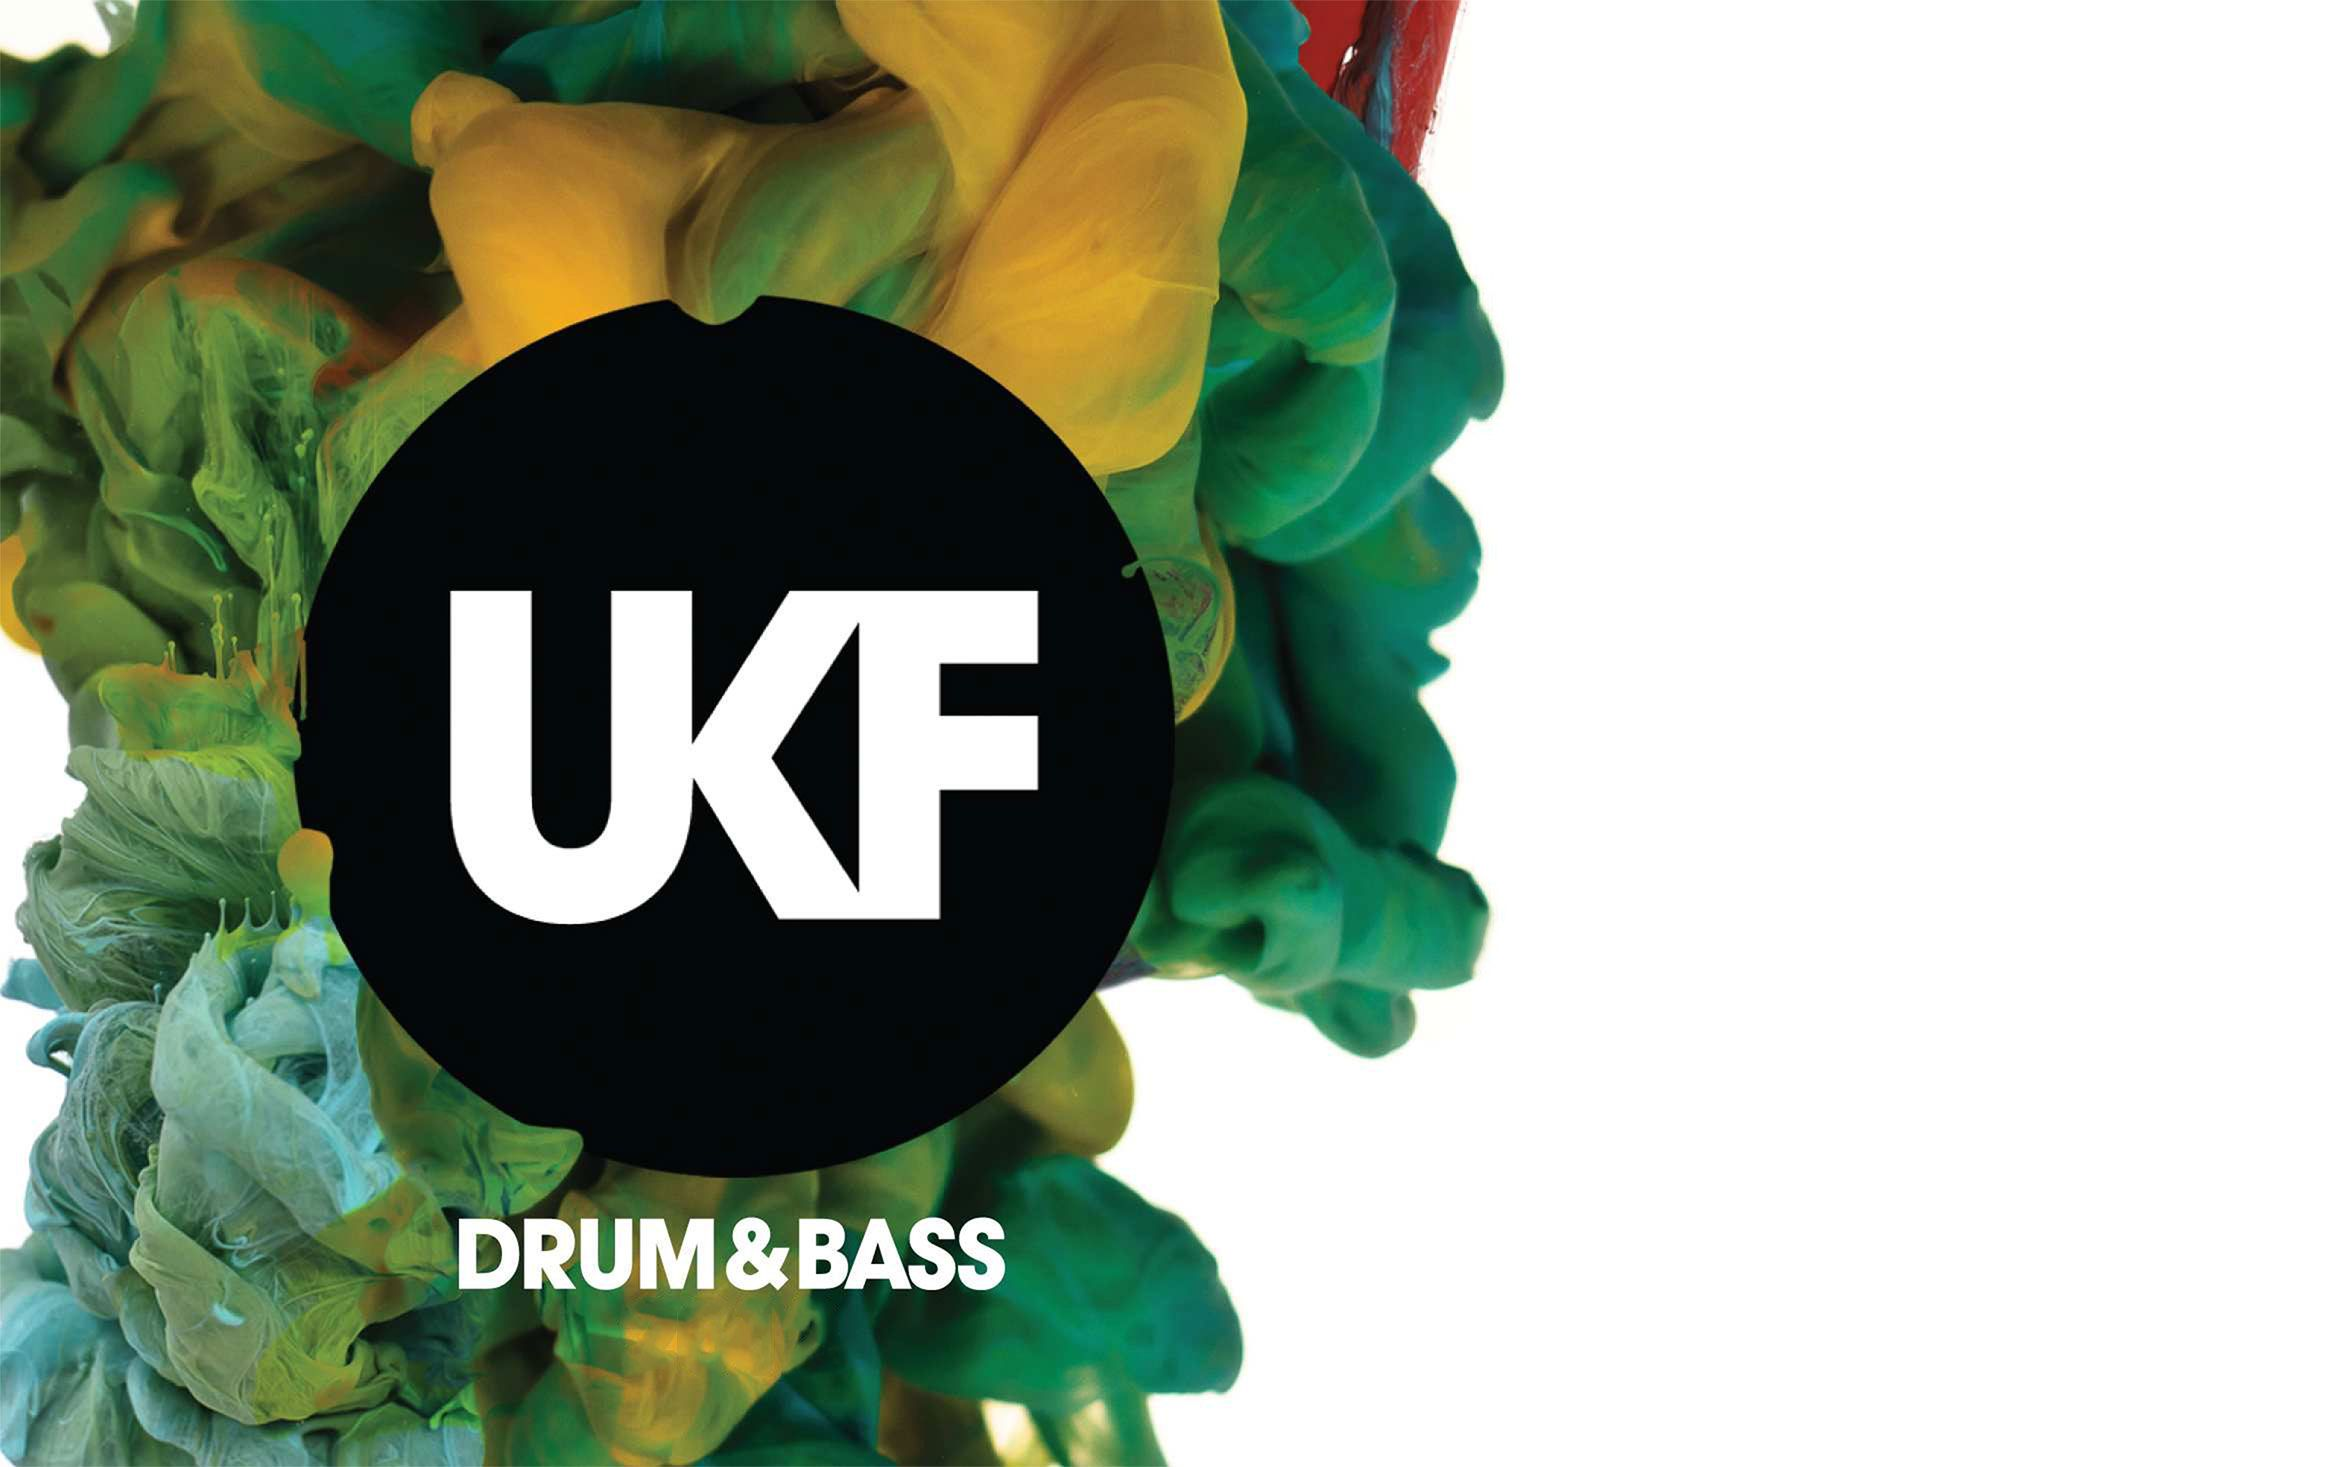 ukf drum bass 2012 megamix